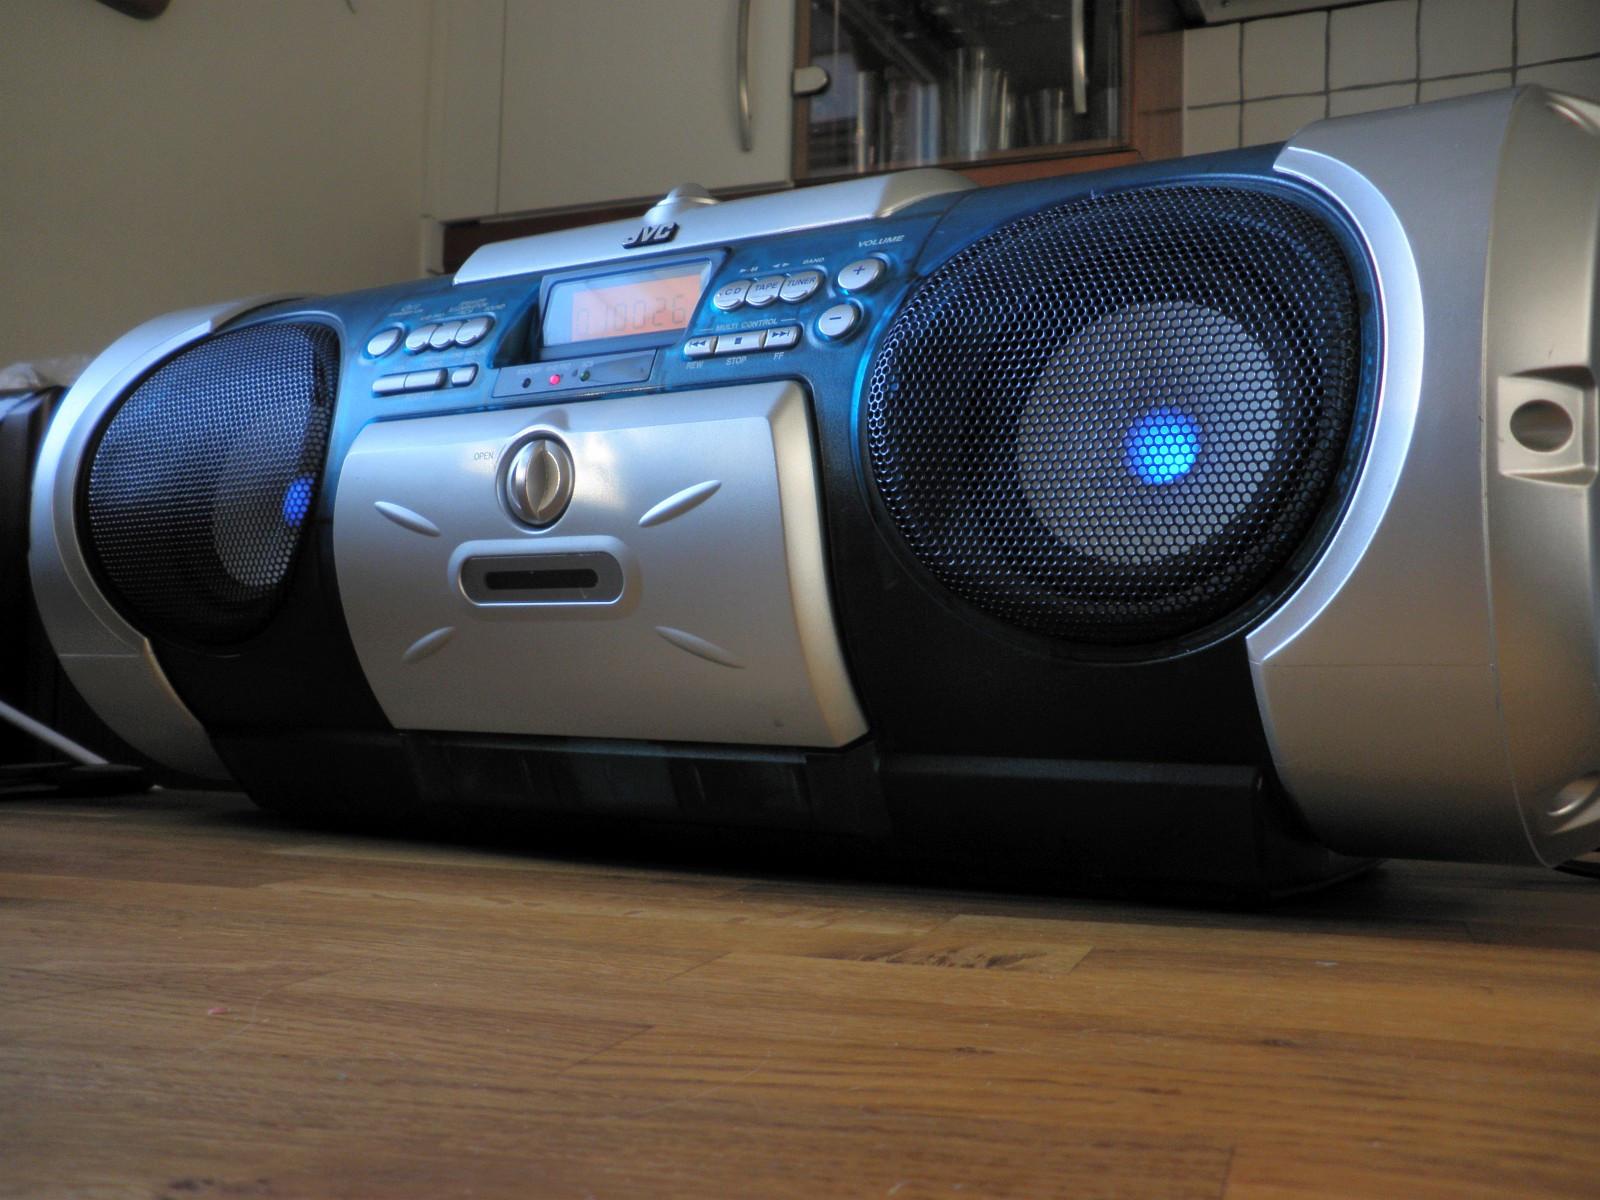 "JVC RV-B550 Kaboom Boombox AM/FM Radio Stereo Cassette CD Player - Lørenskog  - JVC RV-B550 Kaboom Boombox AM/FM Radio Stereo Cassette CD Player vurderes solgt.  Fungerer top. Fantastisk lyd.  Fjernkontroll og strømkabel er inkludert.   ""Quality JVC Kaboom boombox m - Lørenskog"